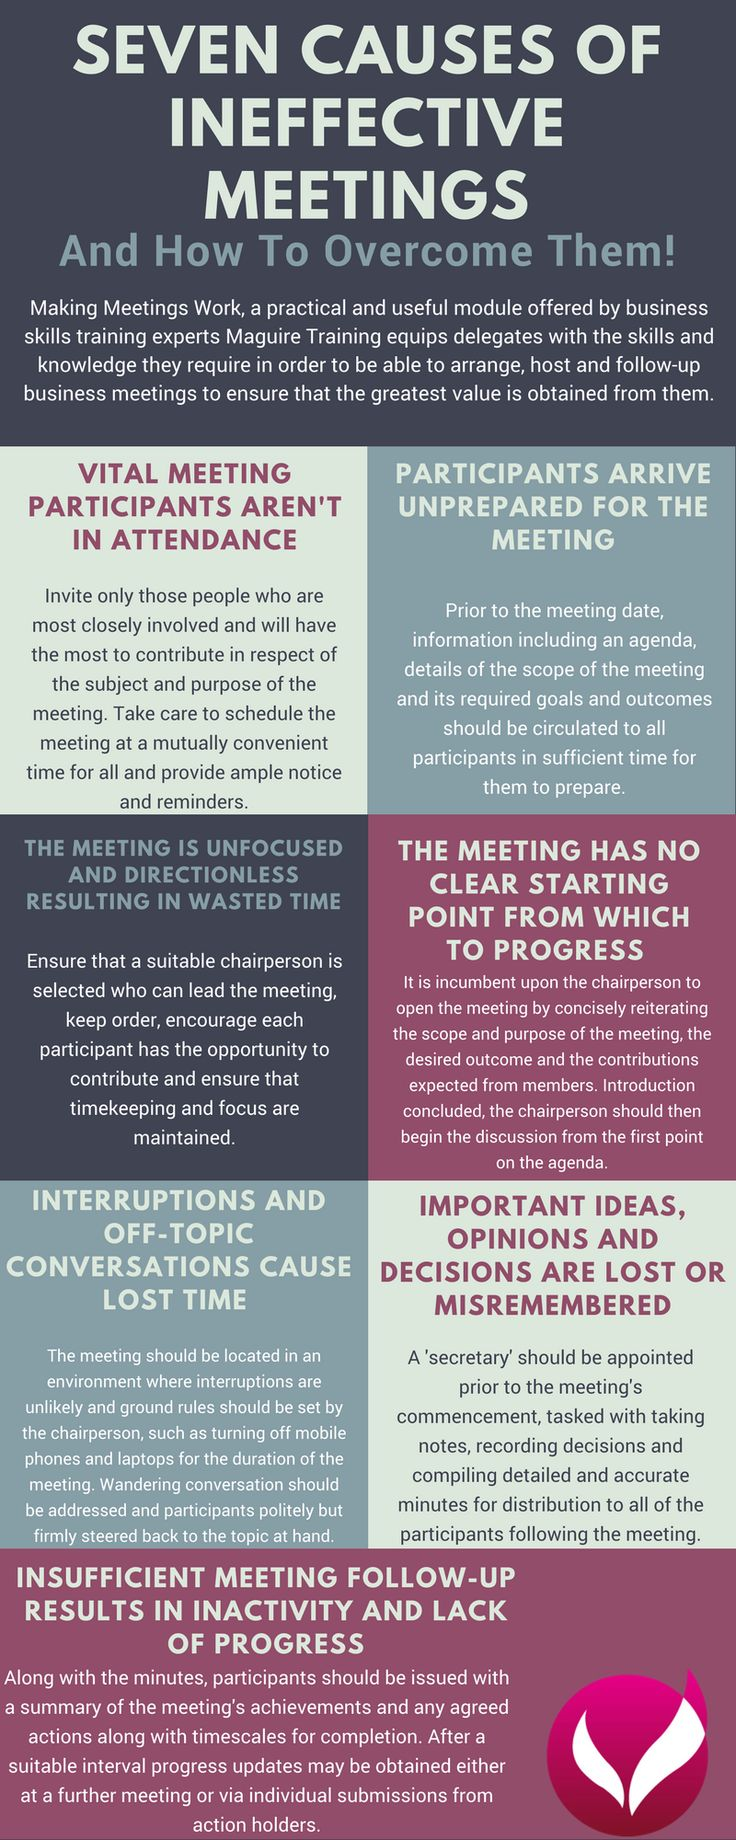 Seven Causes of Ineffective Meetings Best 11